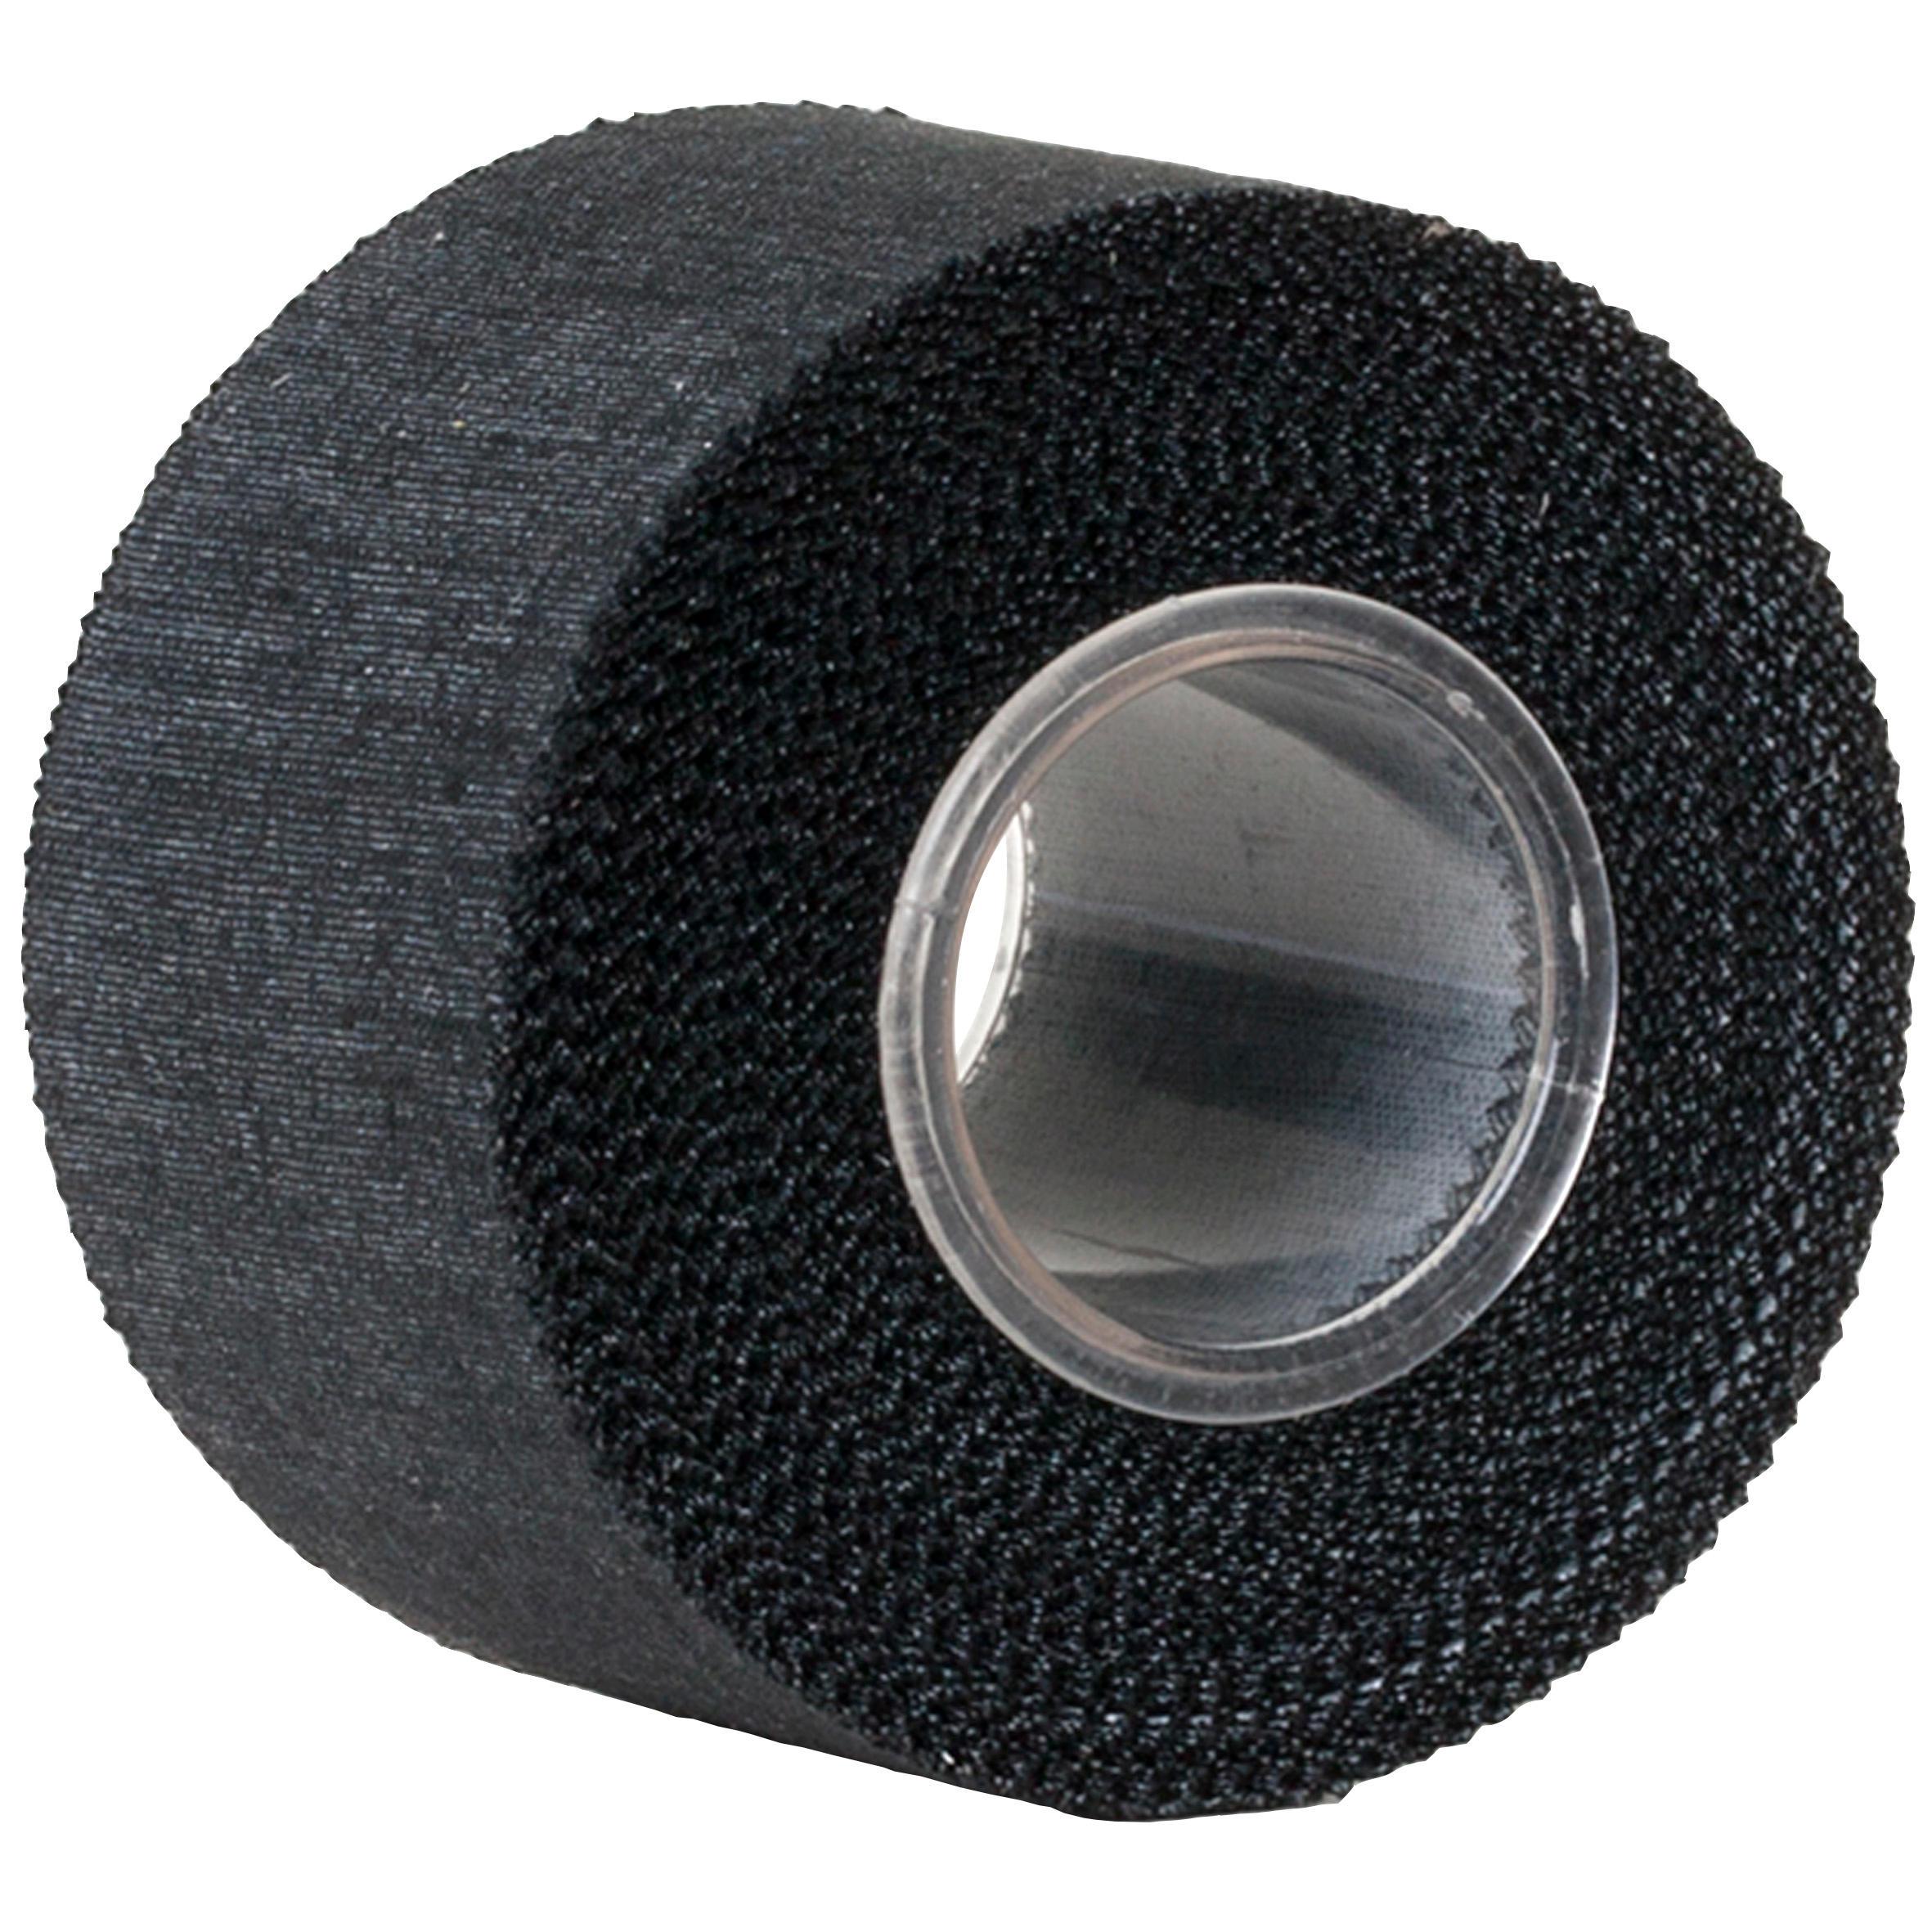 Rigid Strap Tape - Black